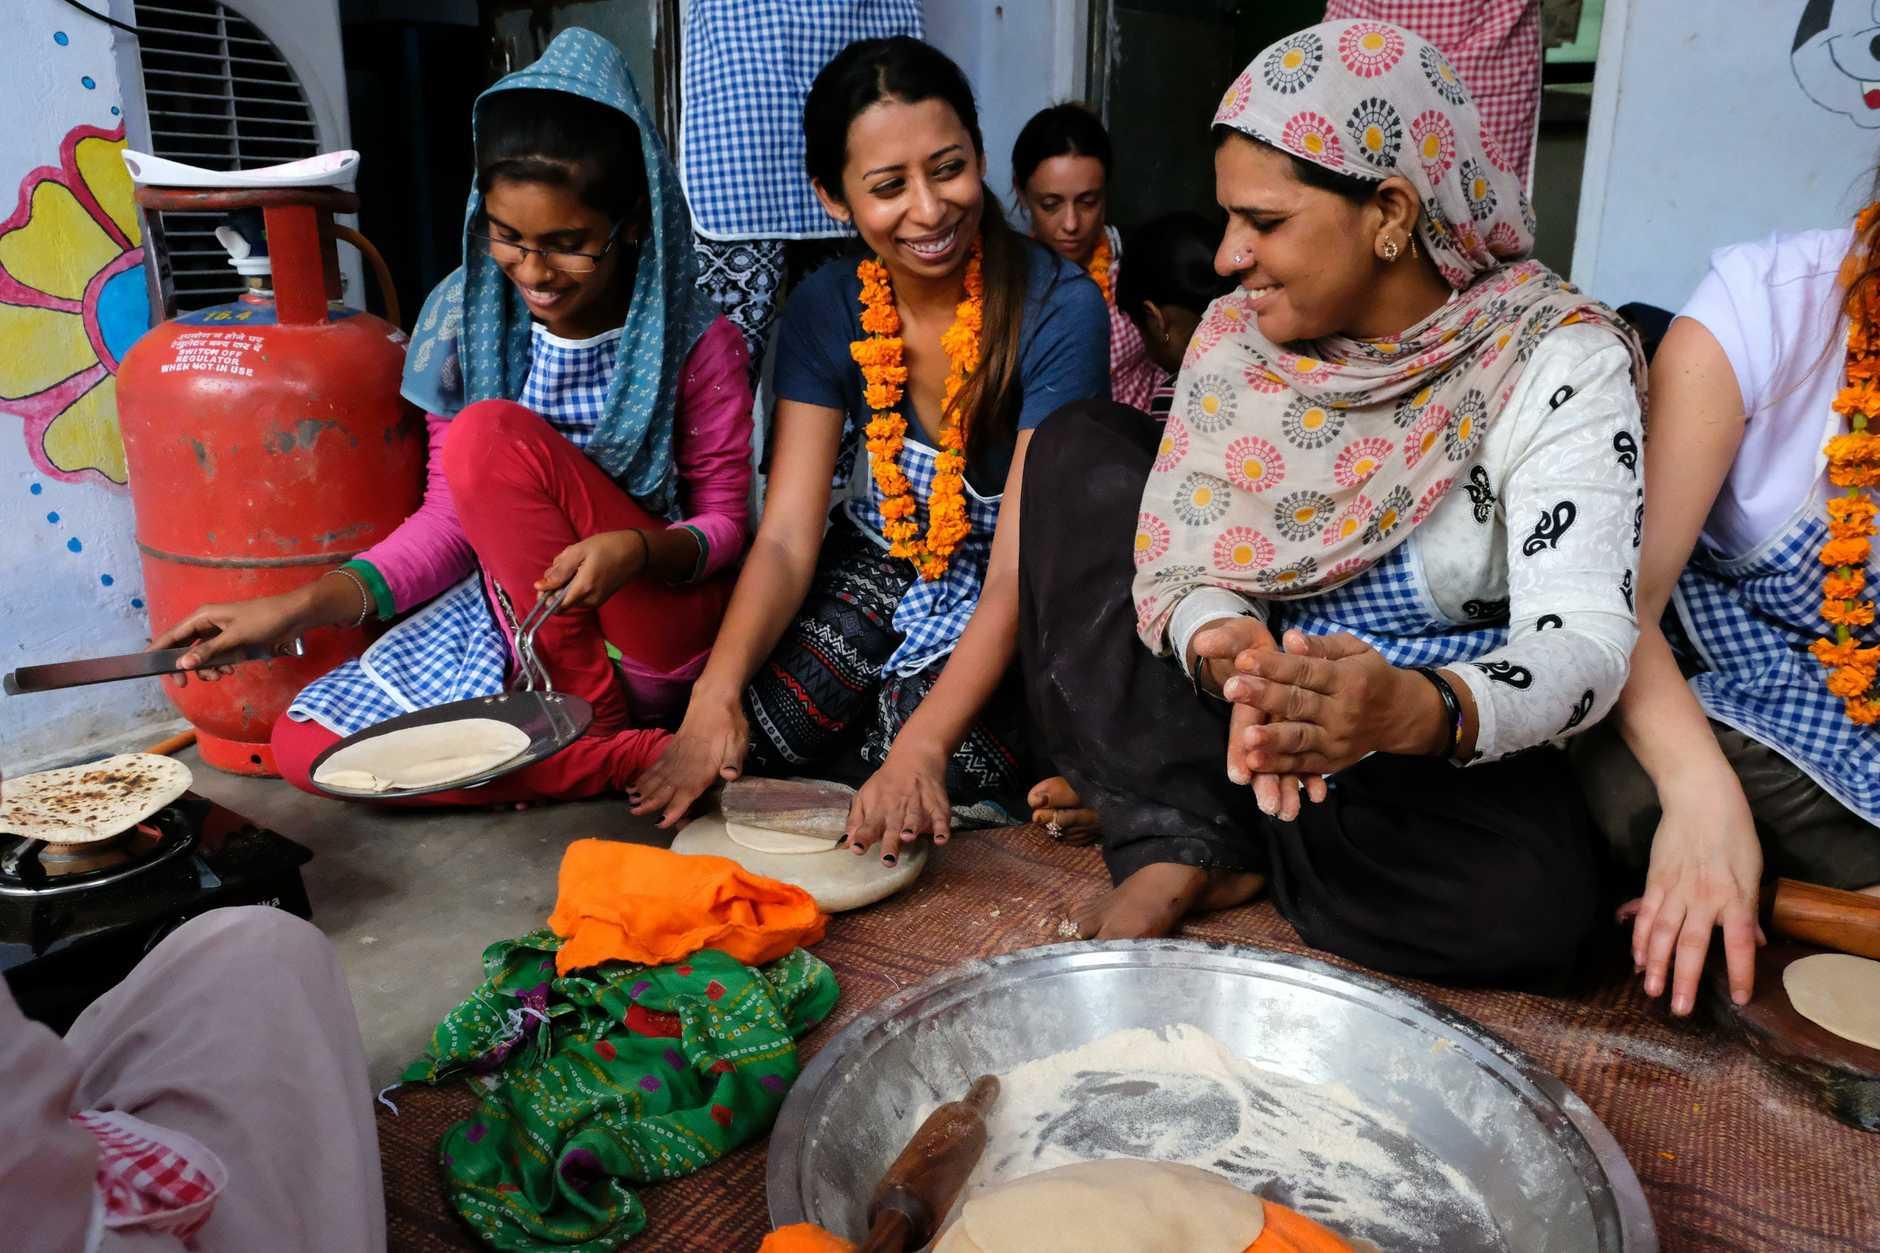 Hands on Journeys Empowerment Tourism tour through Agra, Jaipur and Delhi, Golden Triangle, India. Photo: Whitney Taylor